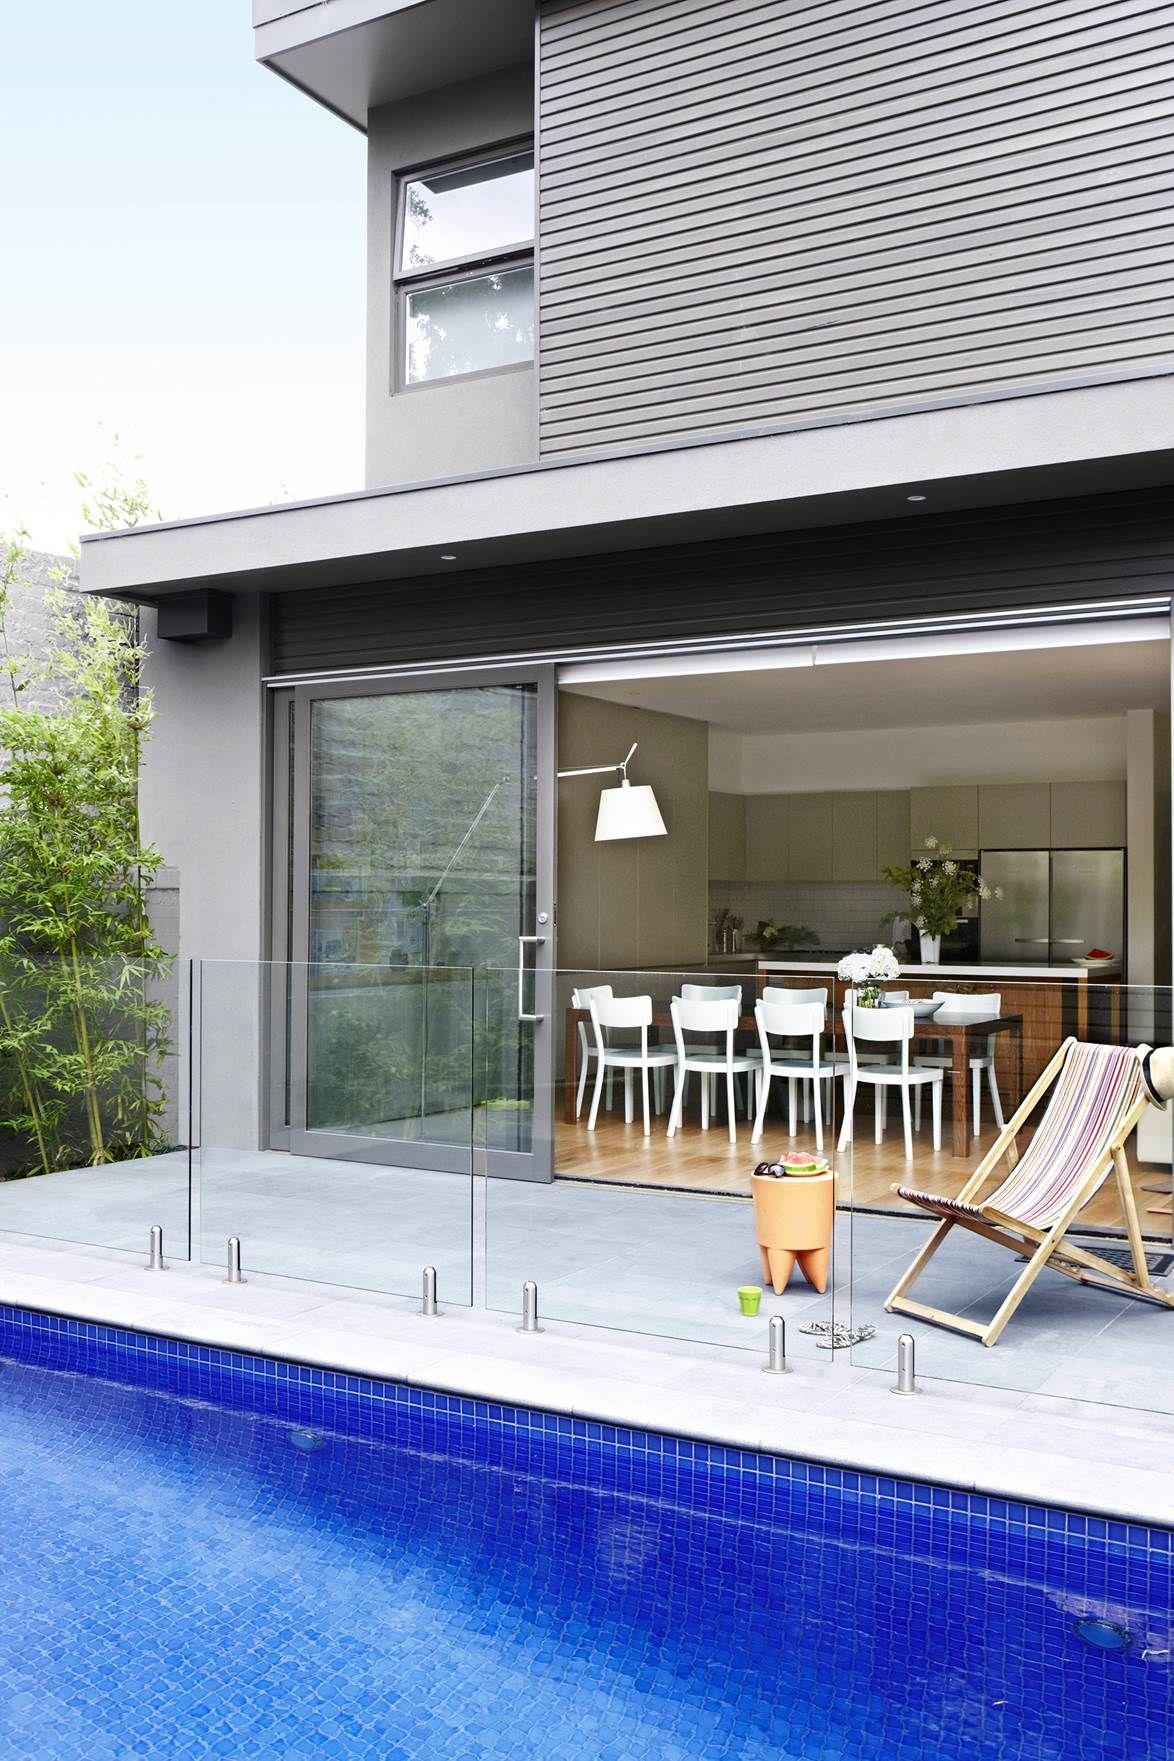 Small Pool Houses